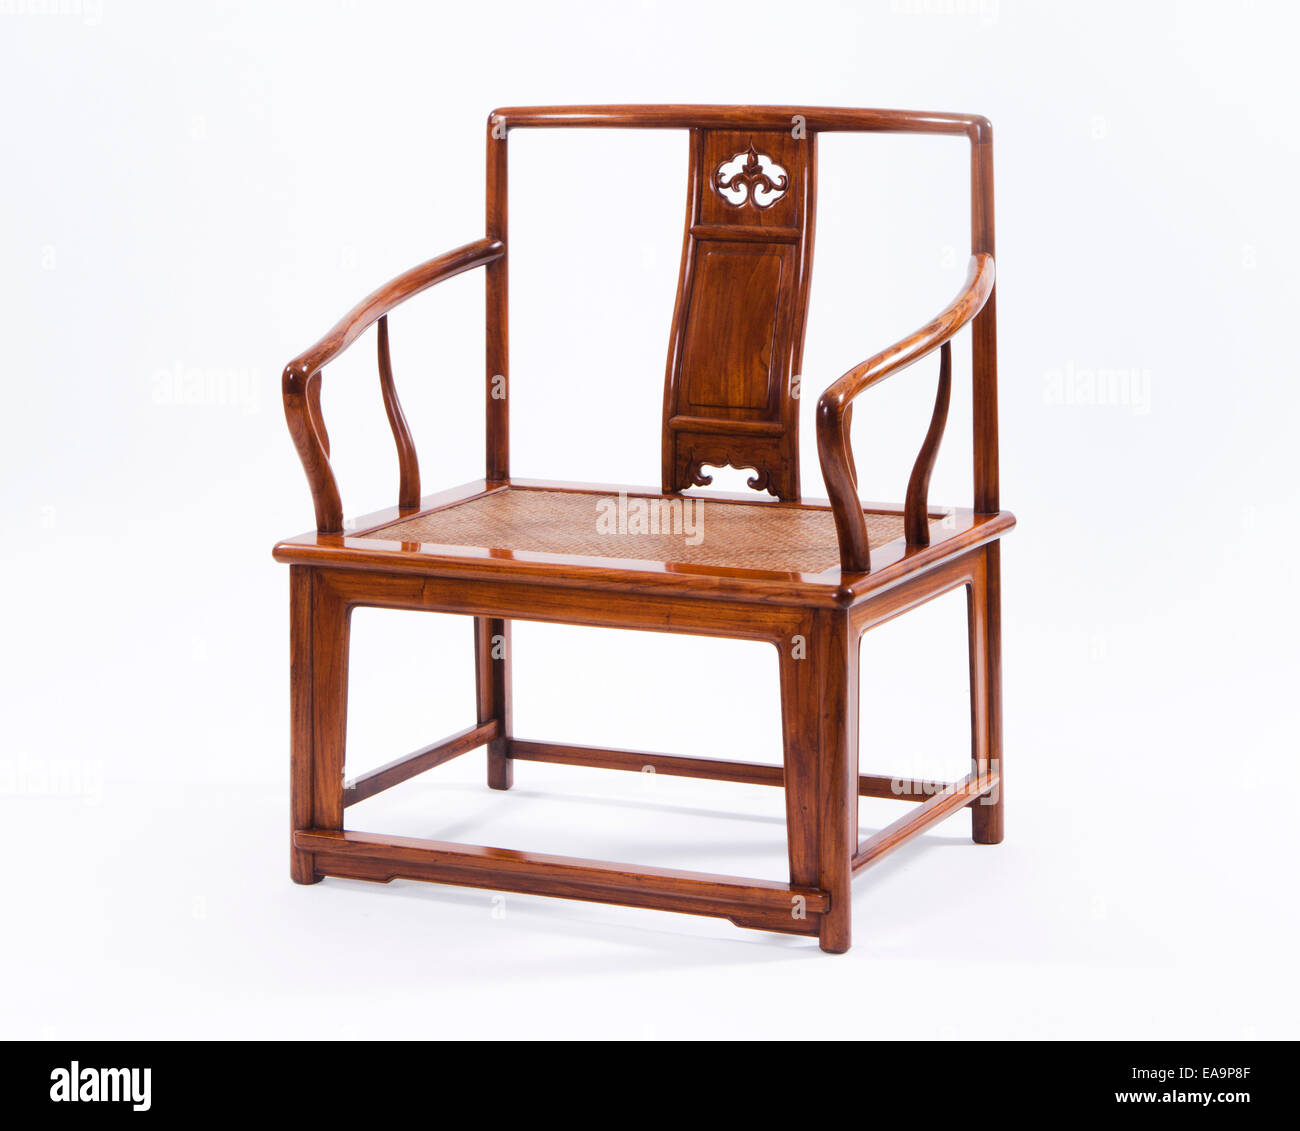 Antique Chinese chair - Antique Chinese Chair Stock Photo: 75203087 - Alamy